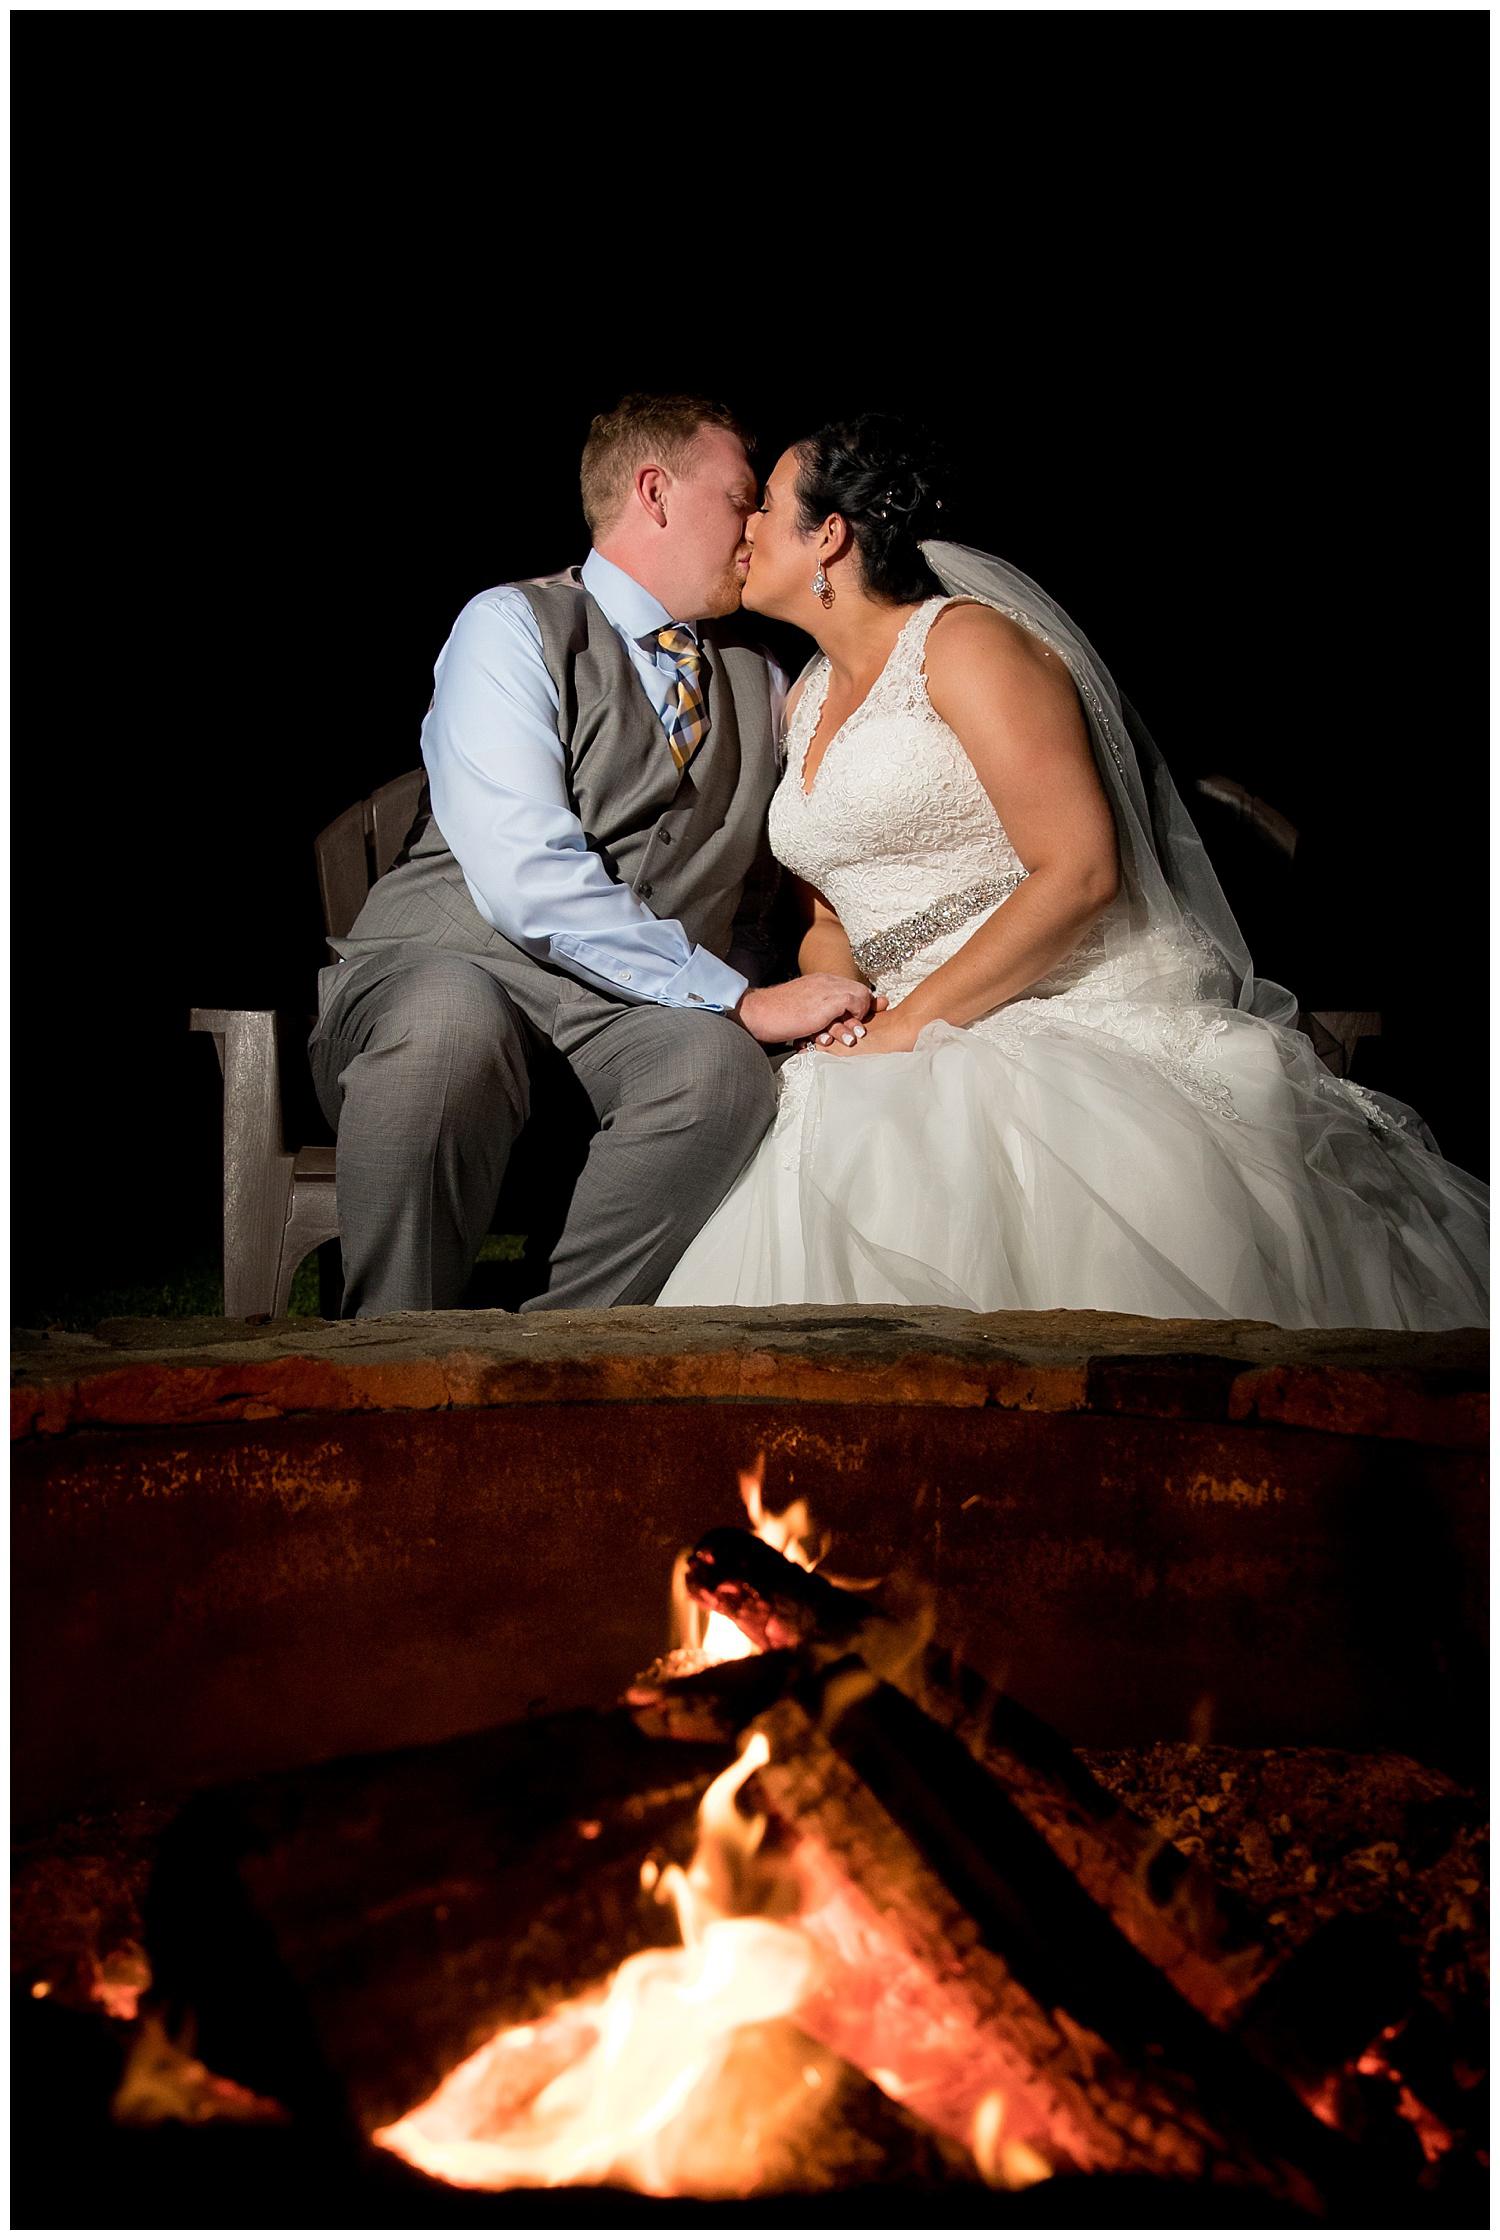 Hillside-Country-Club-Wedding-Photography-26-North-Studios-046.j